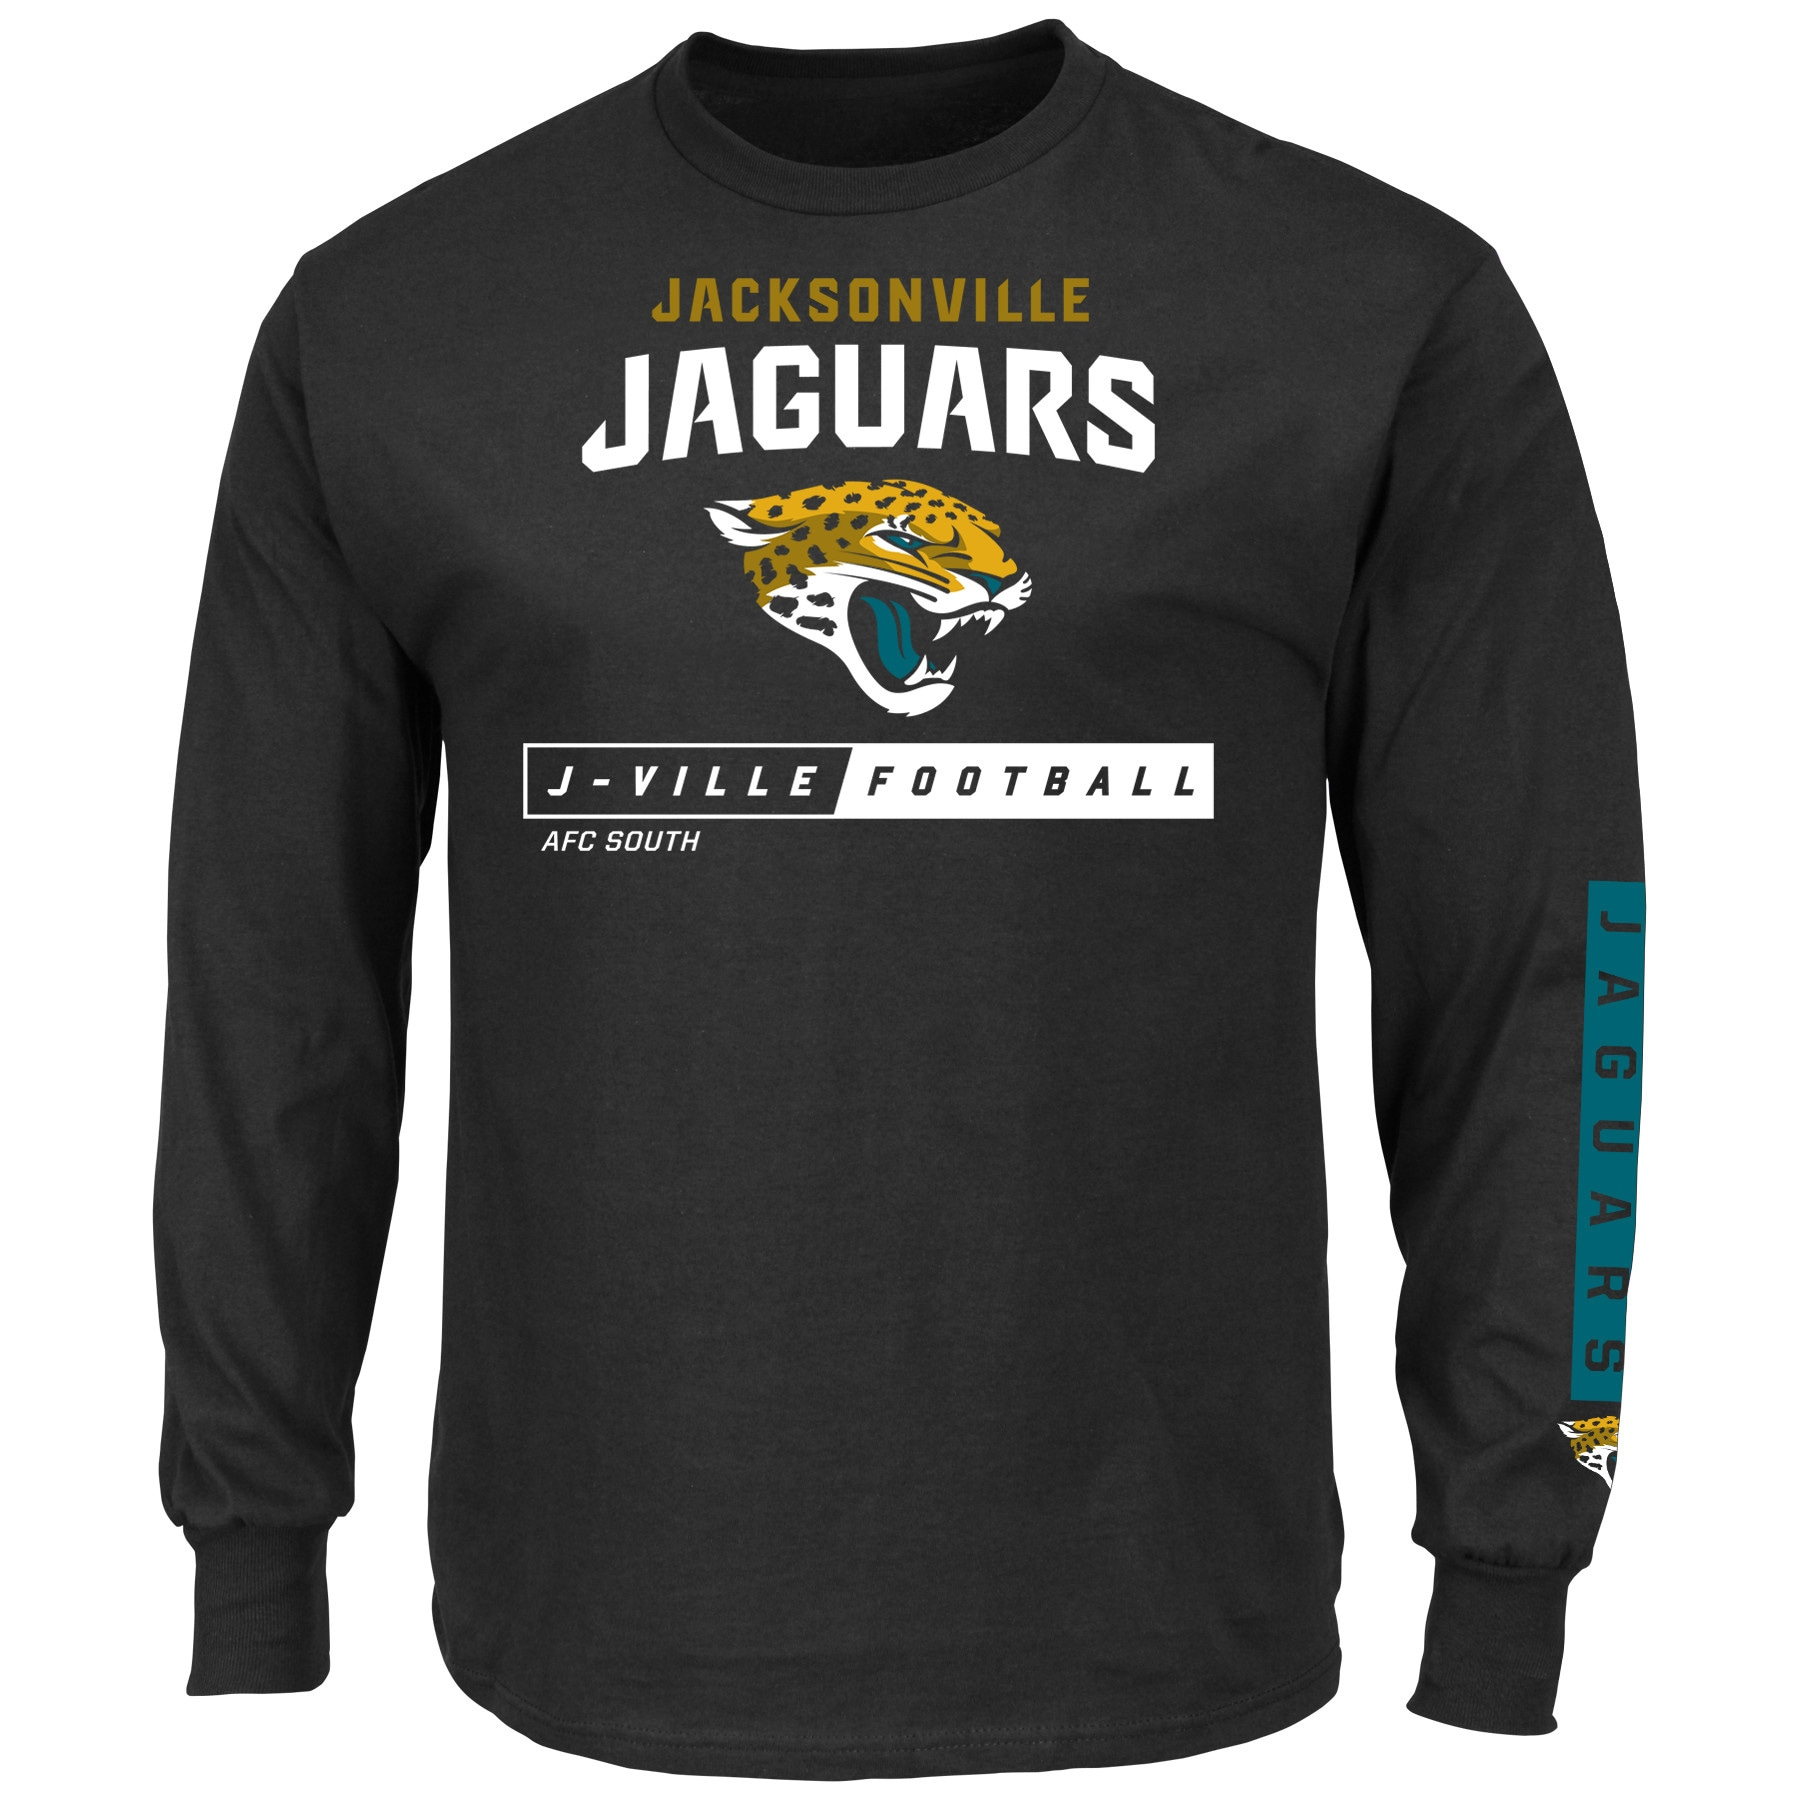 Jacksonville Jaguars Majestic Big & Tall Primary Receiver Long Sleeve T-Shirt - Black